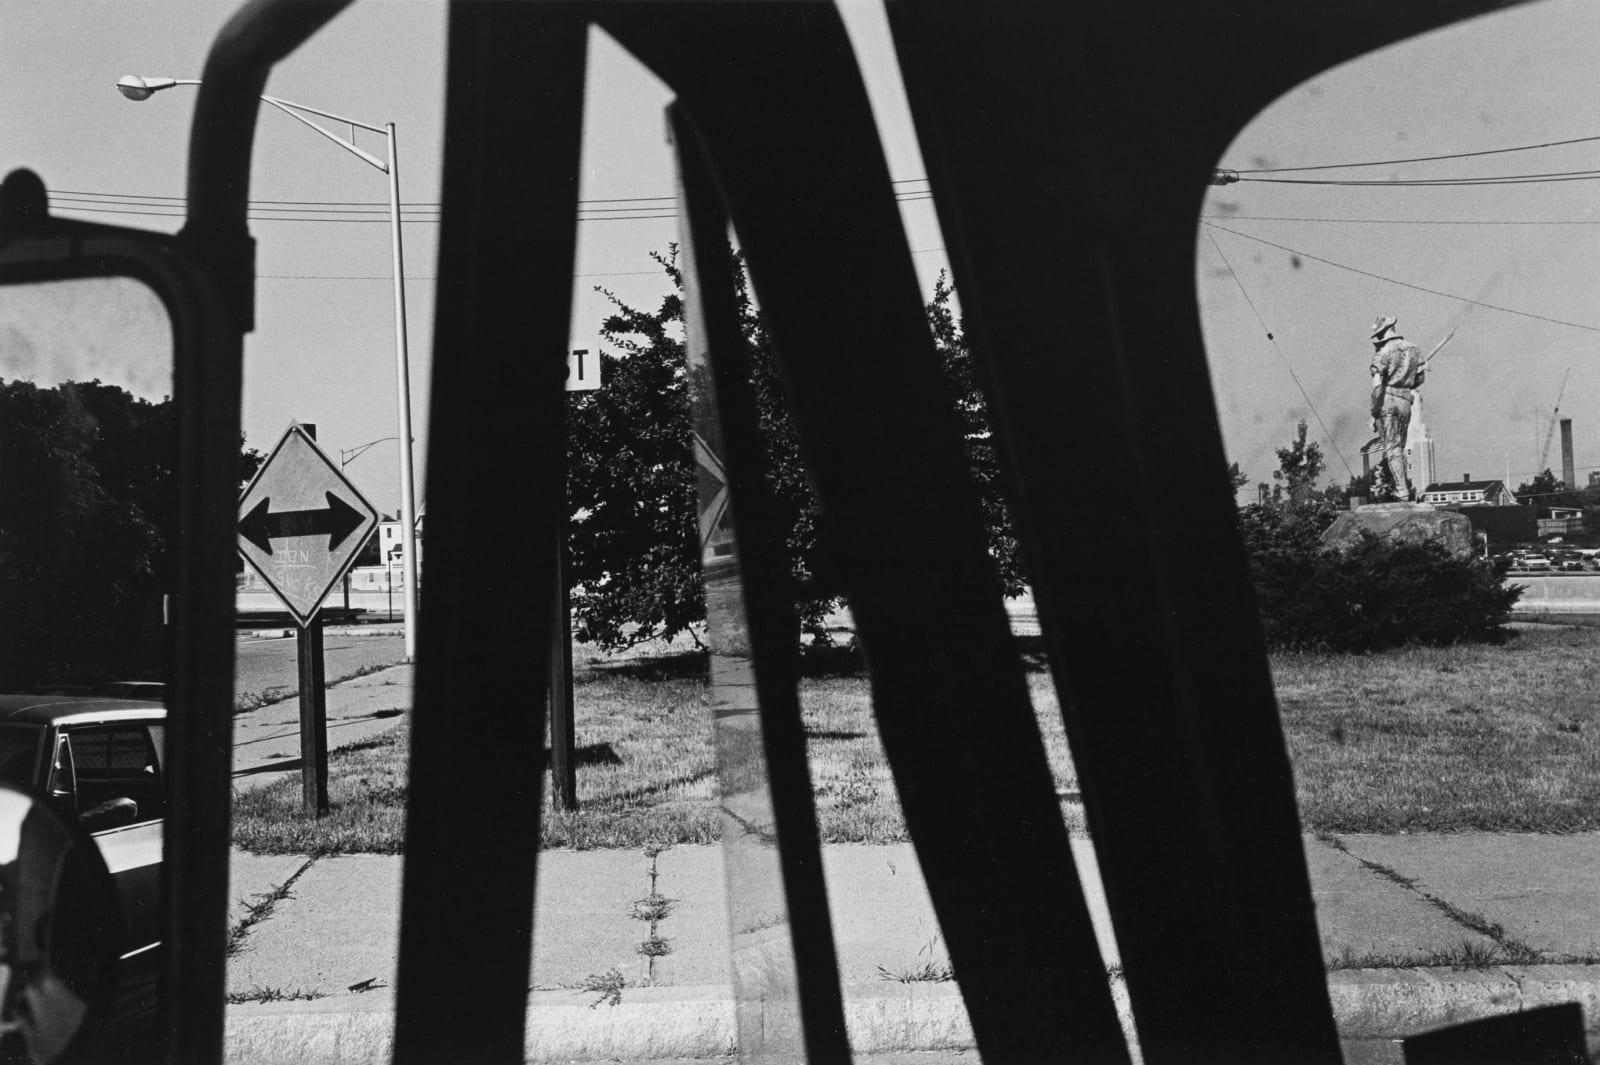 Lee Friedlander - Statue, New Jersey, 1971